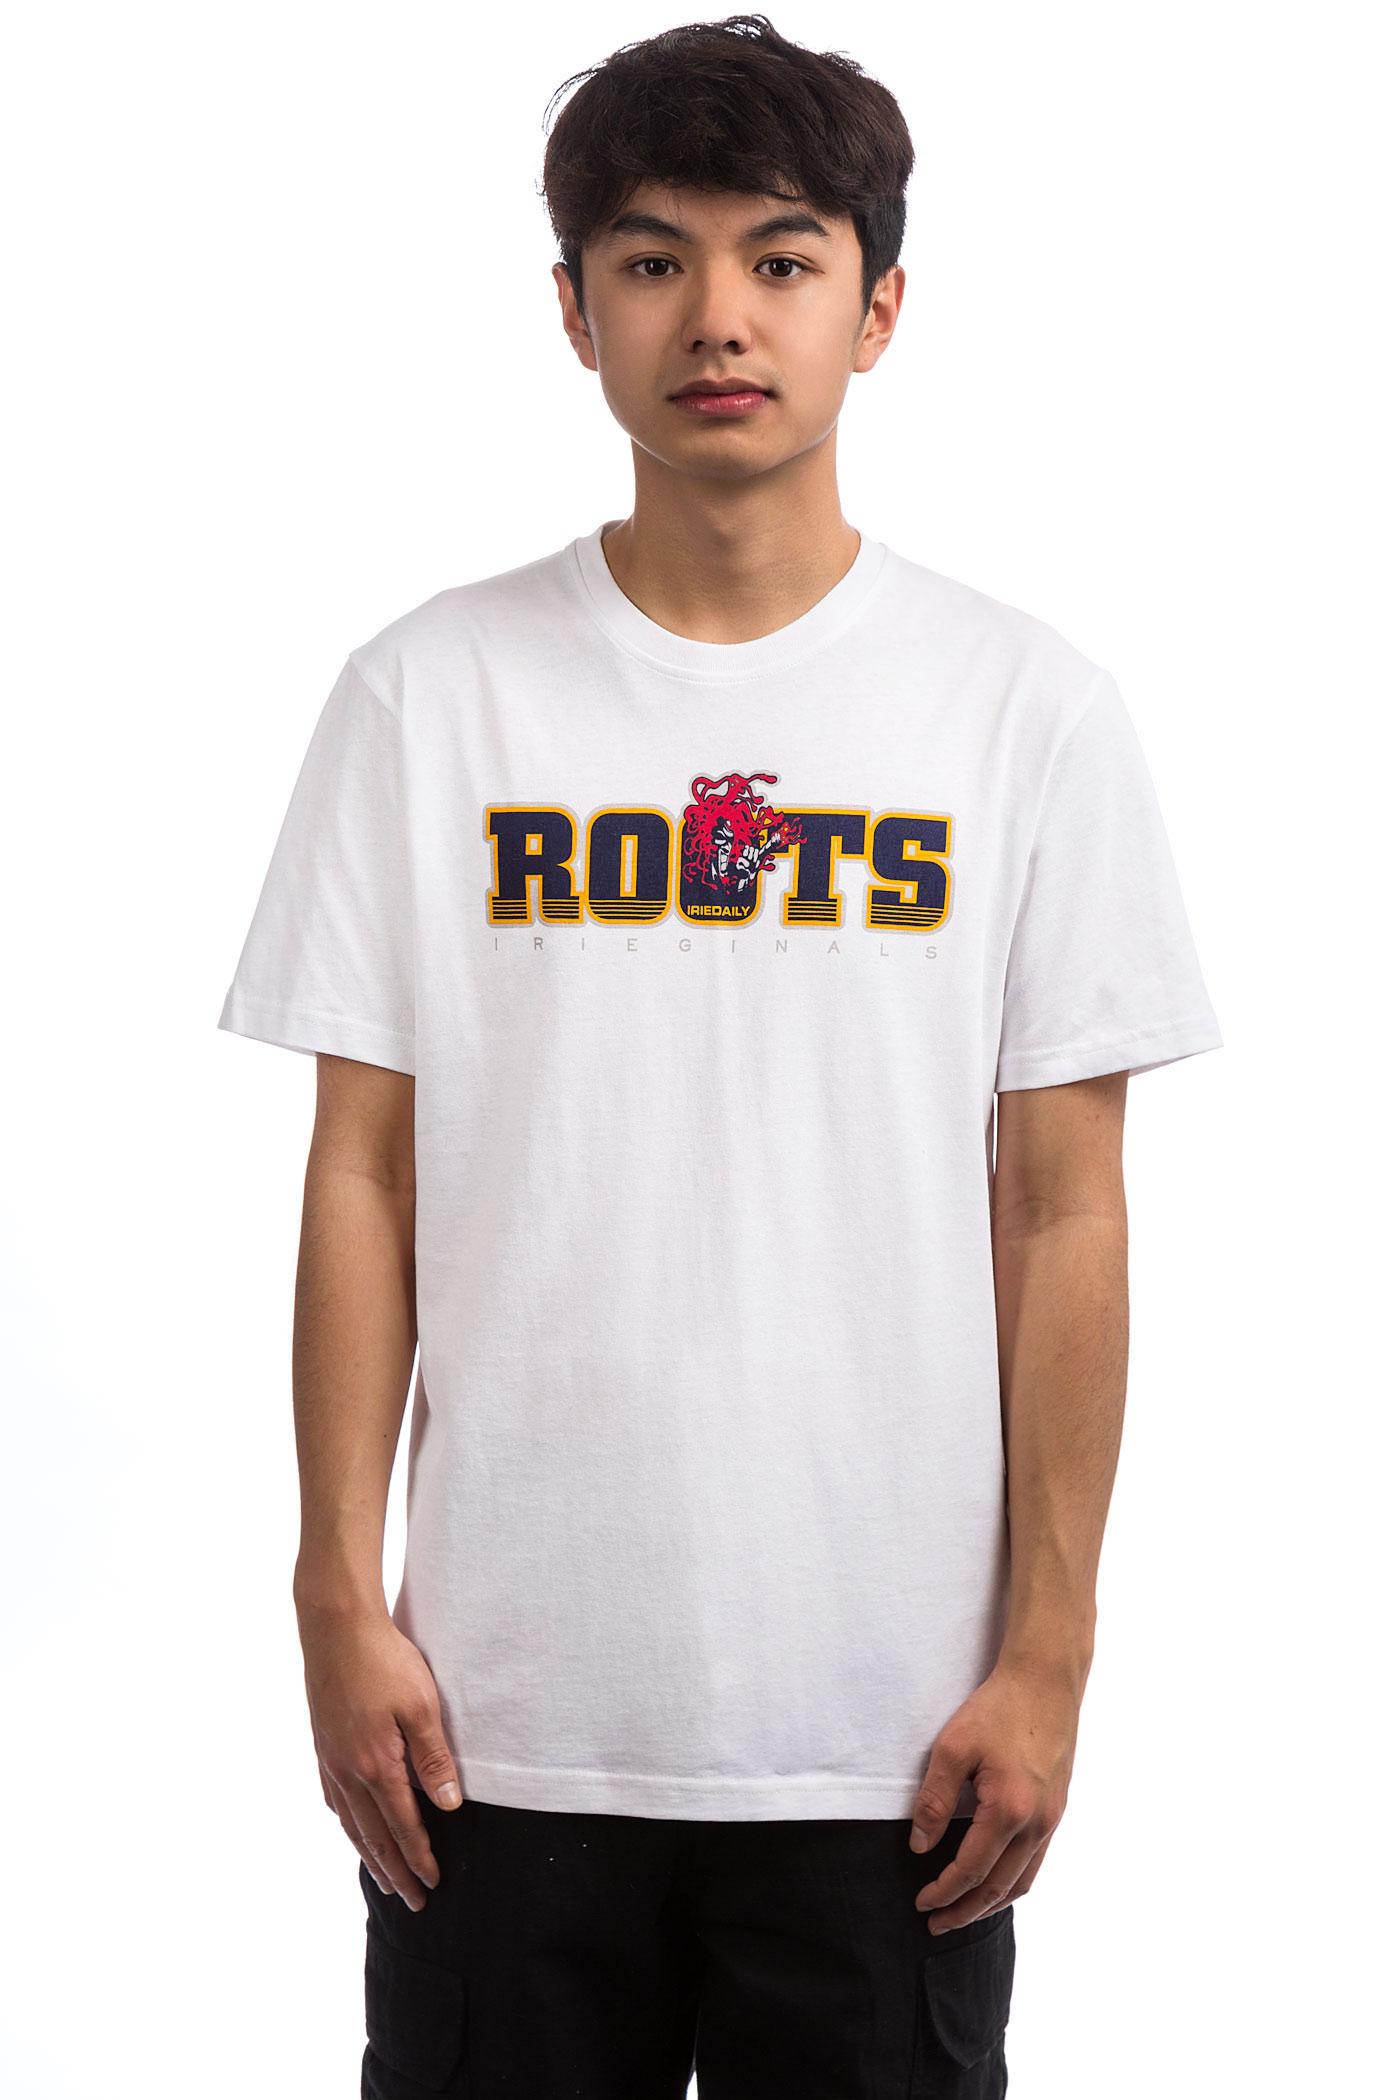 Iriedaily Roots T T shirtwhite Iriedaily Roots Iriedaily Roots shirtwhite Iriedaily Roots T shirtwhite 54qARcL3j